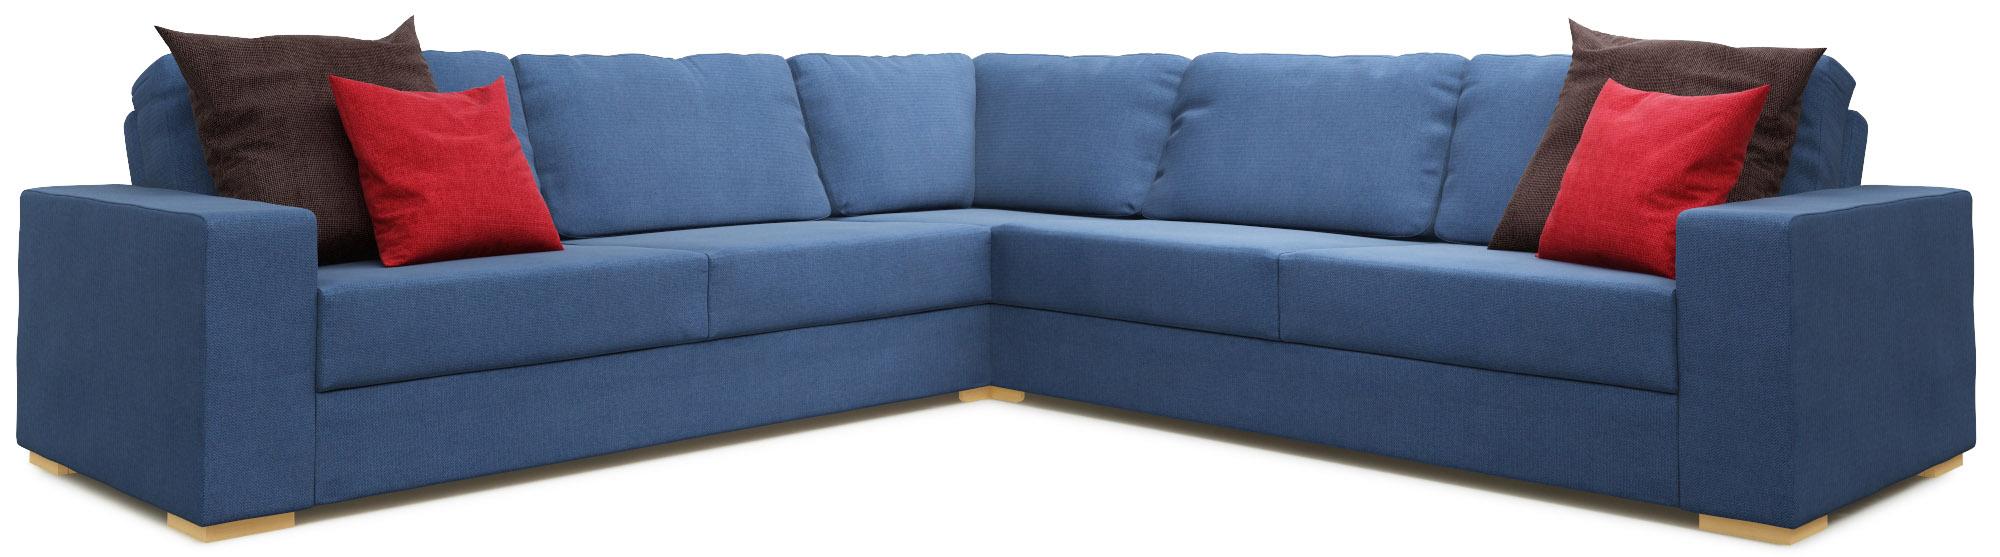 Sui 3X3 Corner Double Sofa Bed